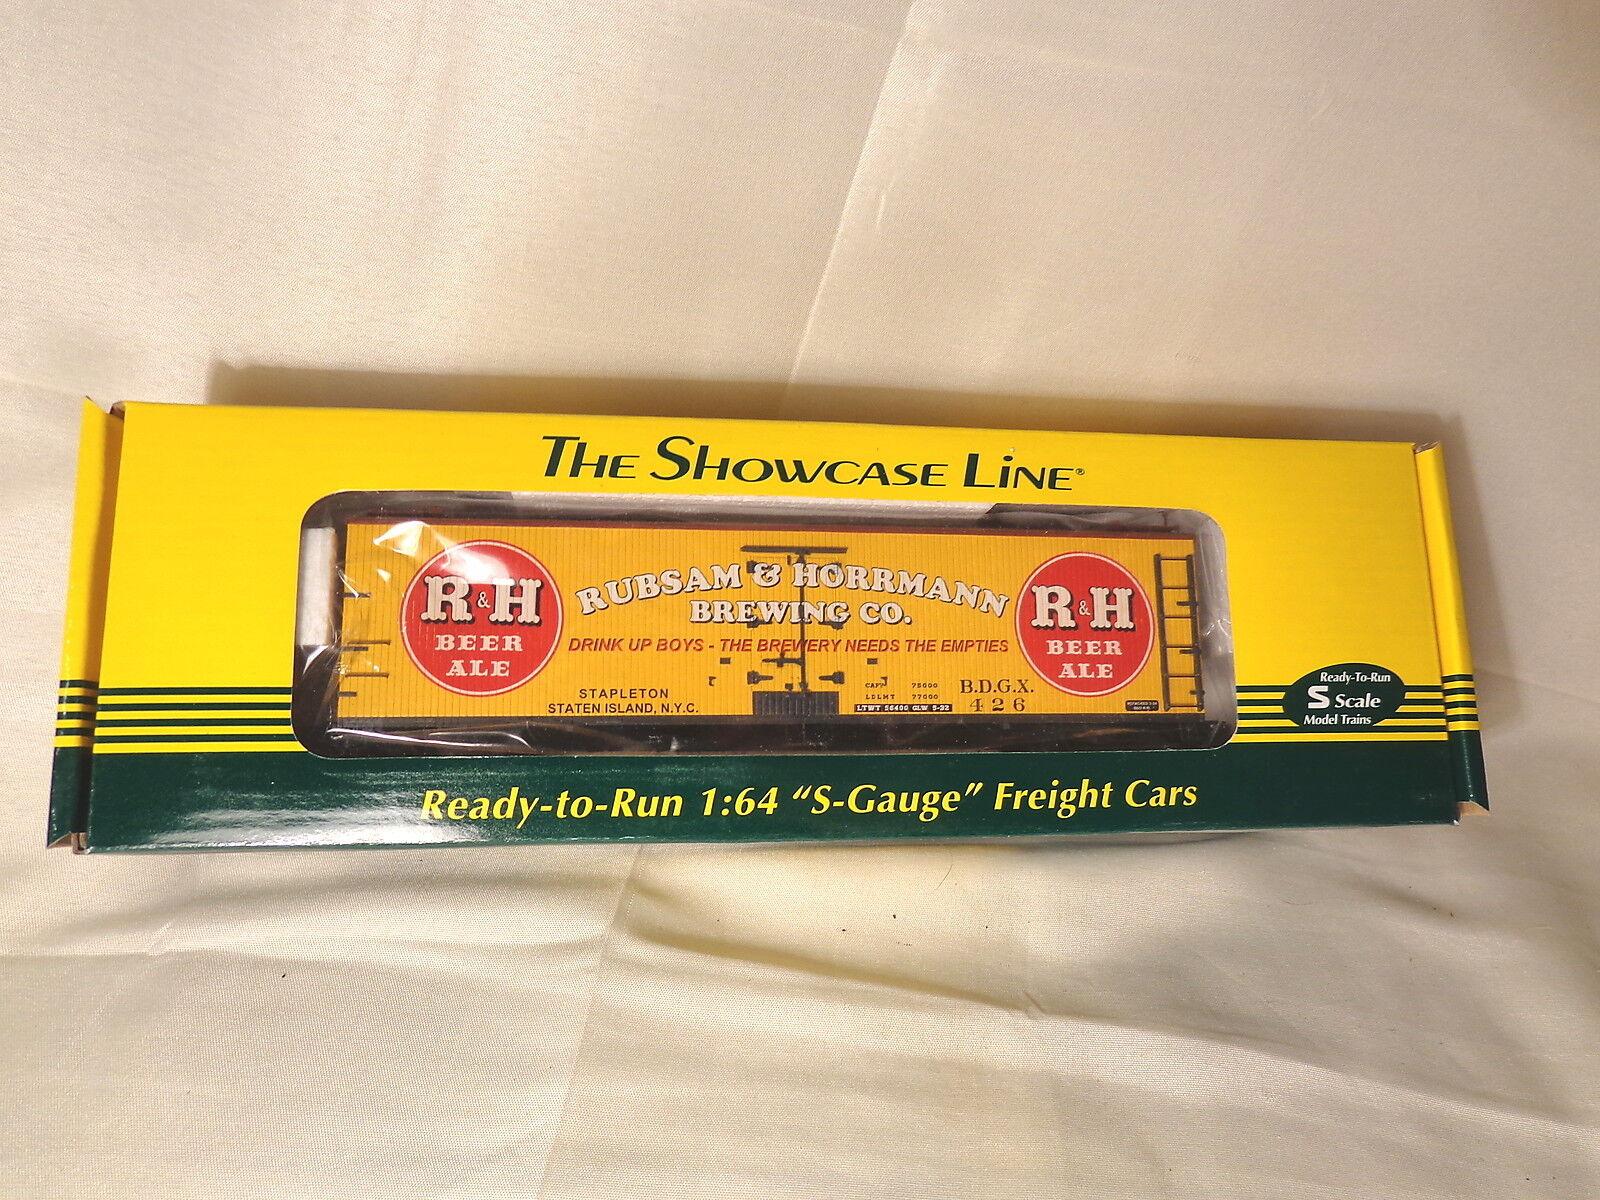 S-Helper Service  01949 R&H Beer Reefer BDGX 426    S Gauge   Boxed